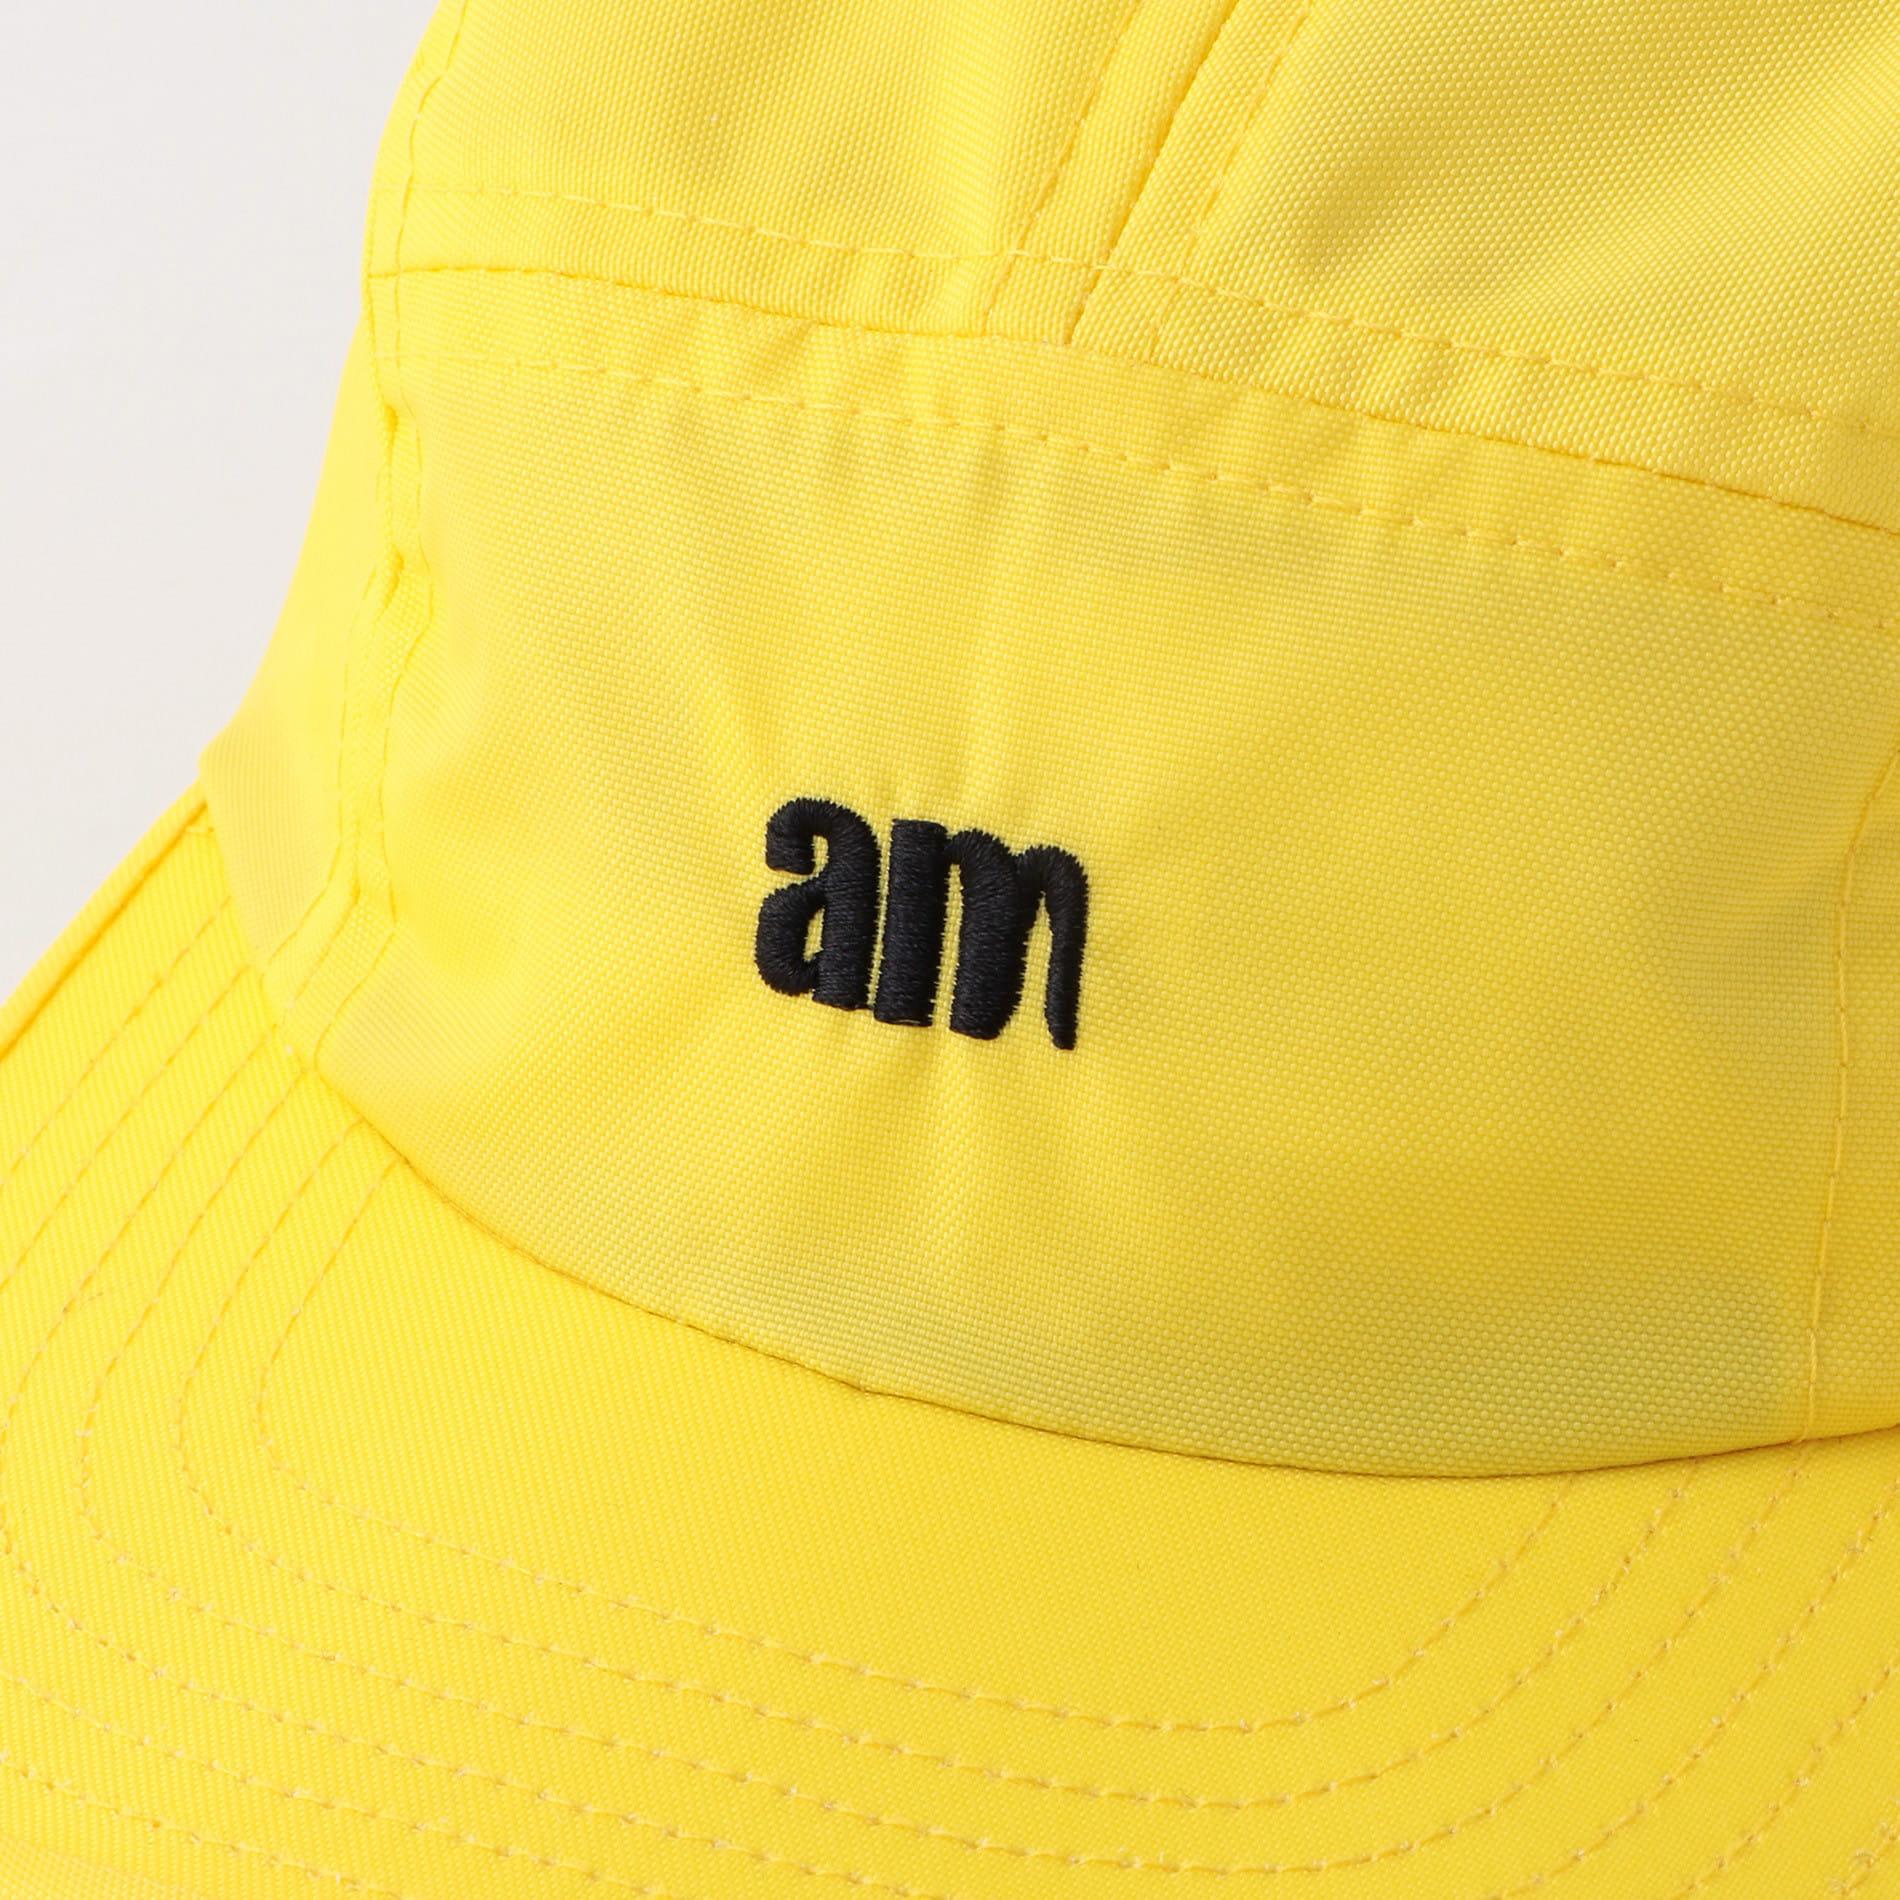 【am(After Midnight)】MEN キャップ SS19-HT033